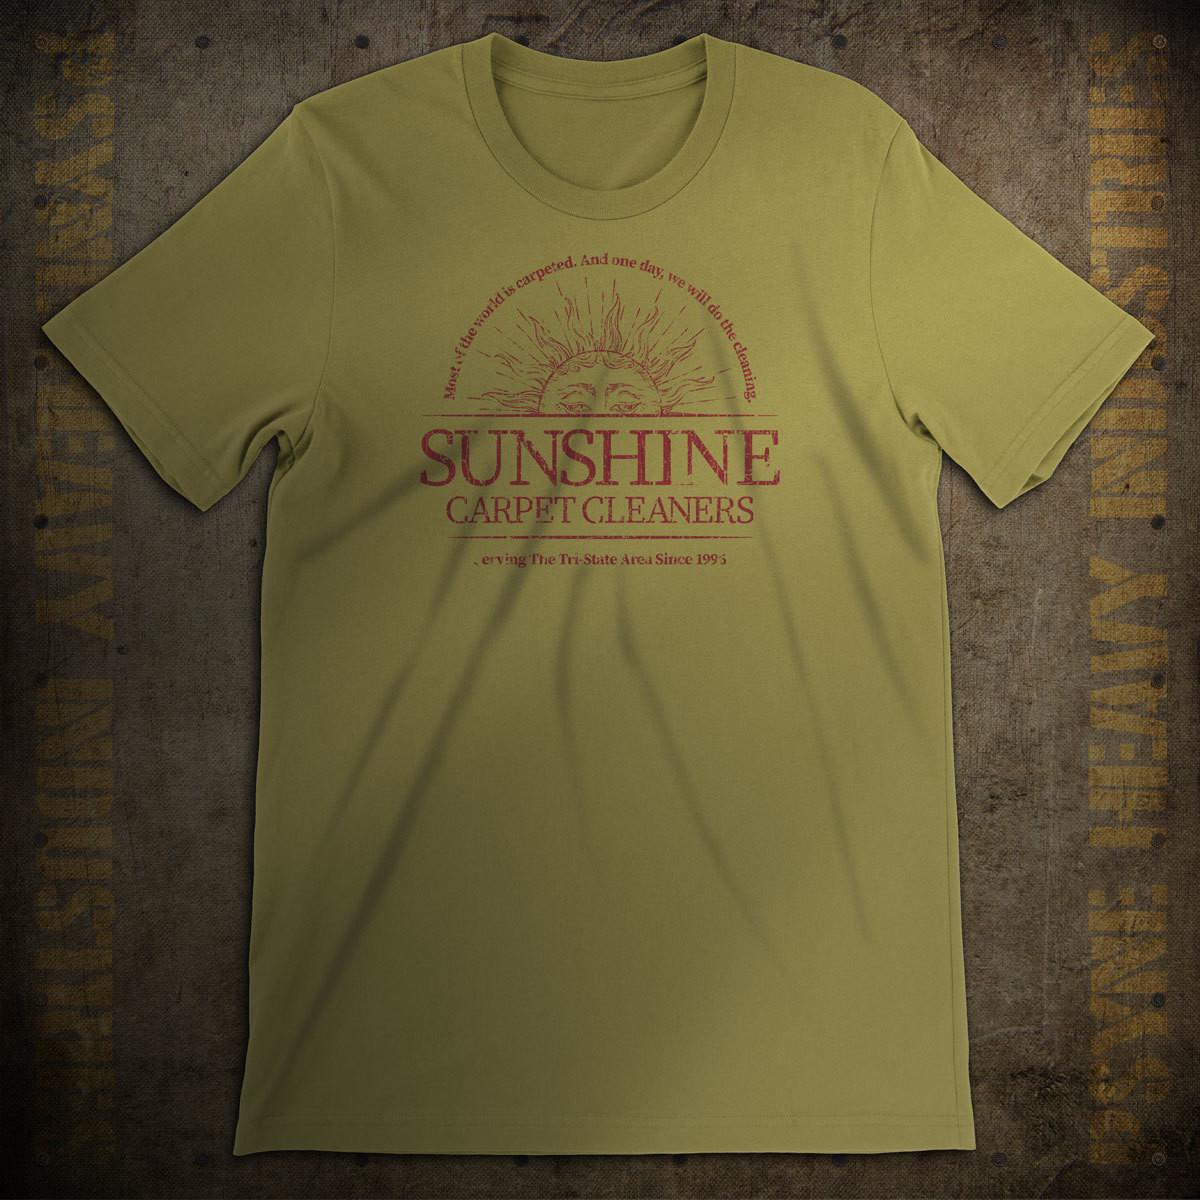 Sunshine Carpet Cleaners Vintage T-Shirt